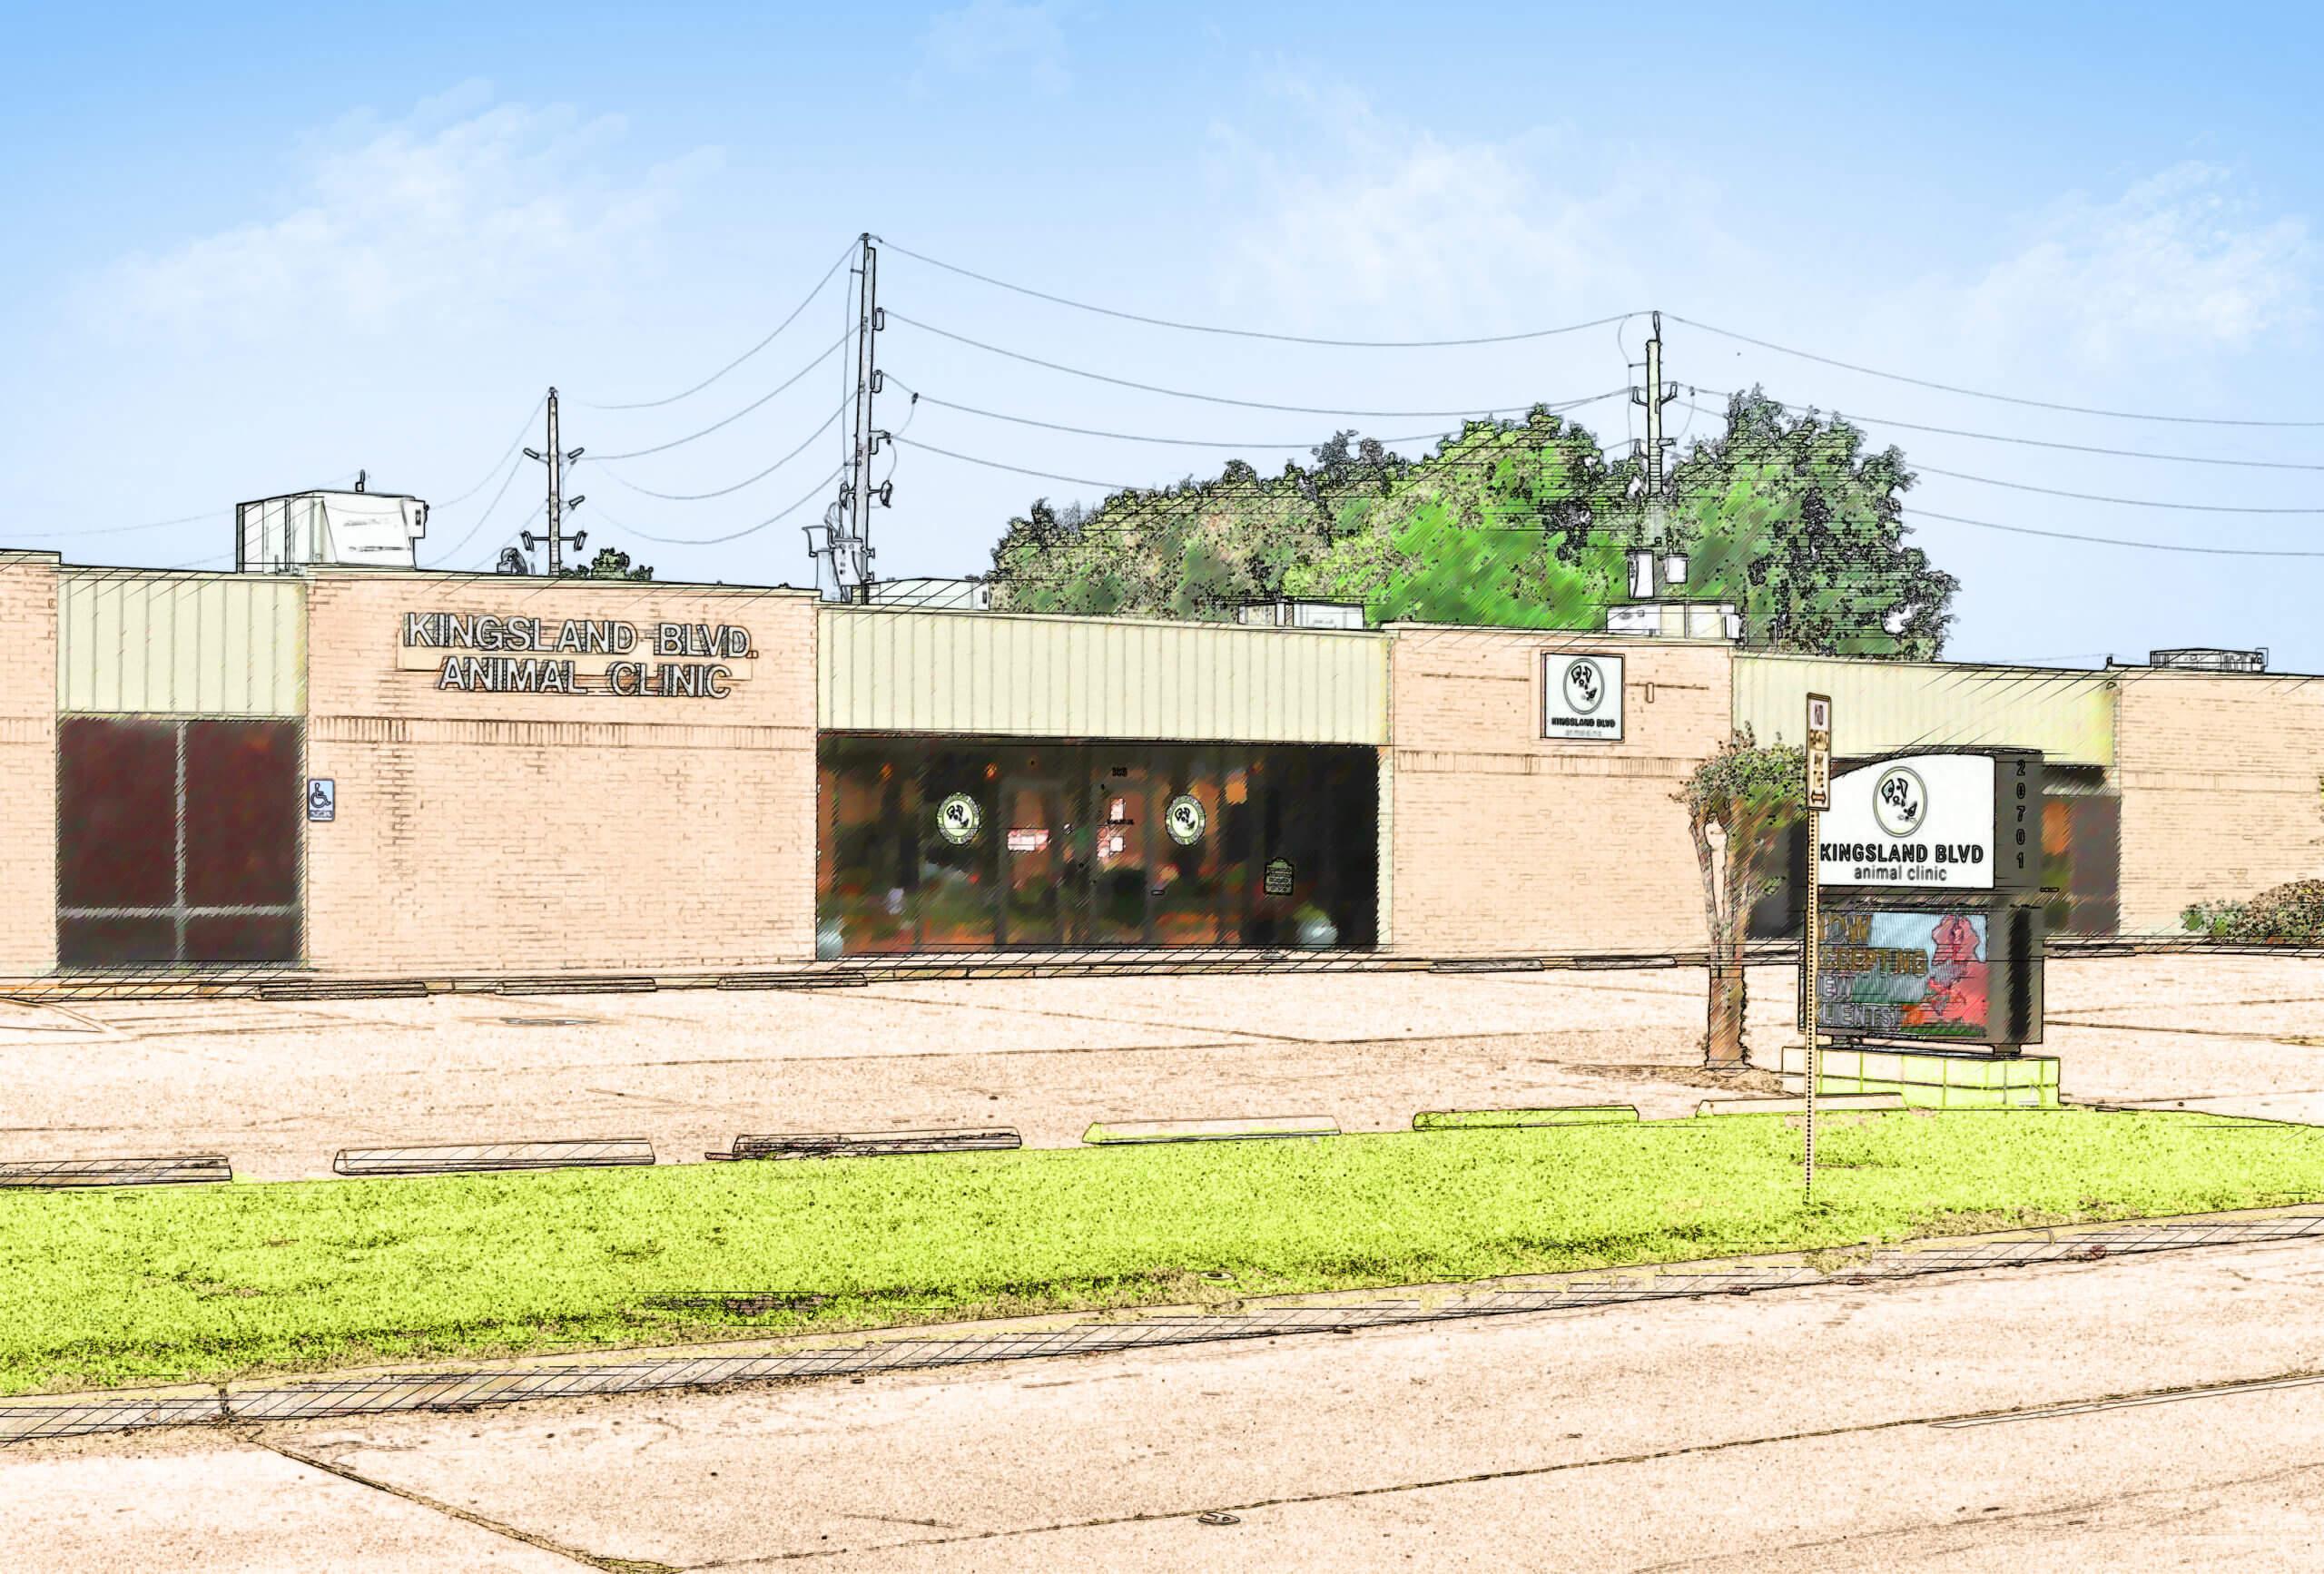 Exterior Kingsland Blvd Animal Clinic building